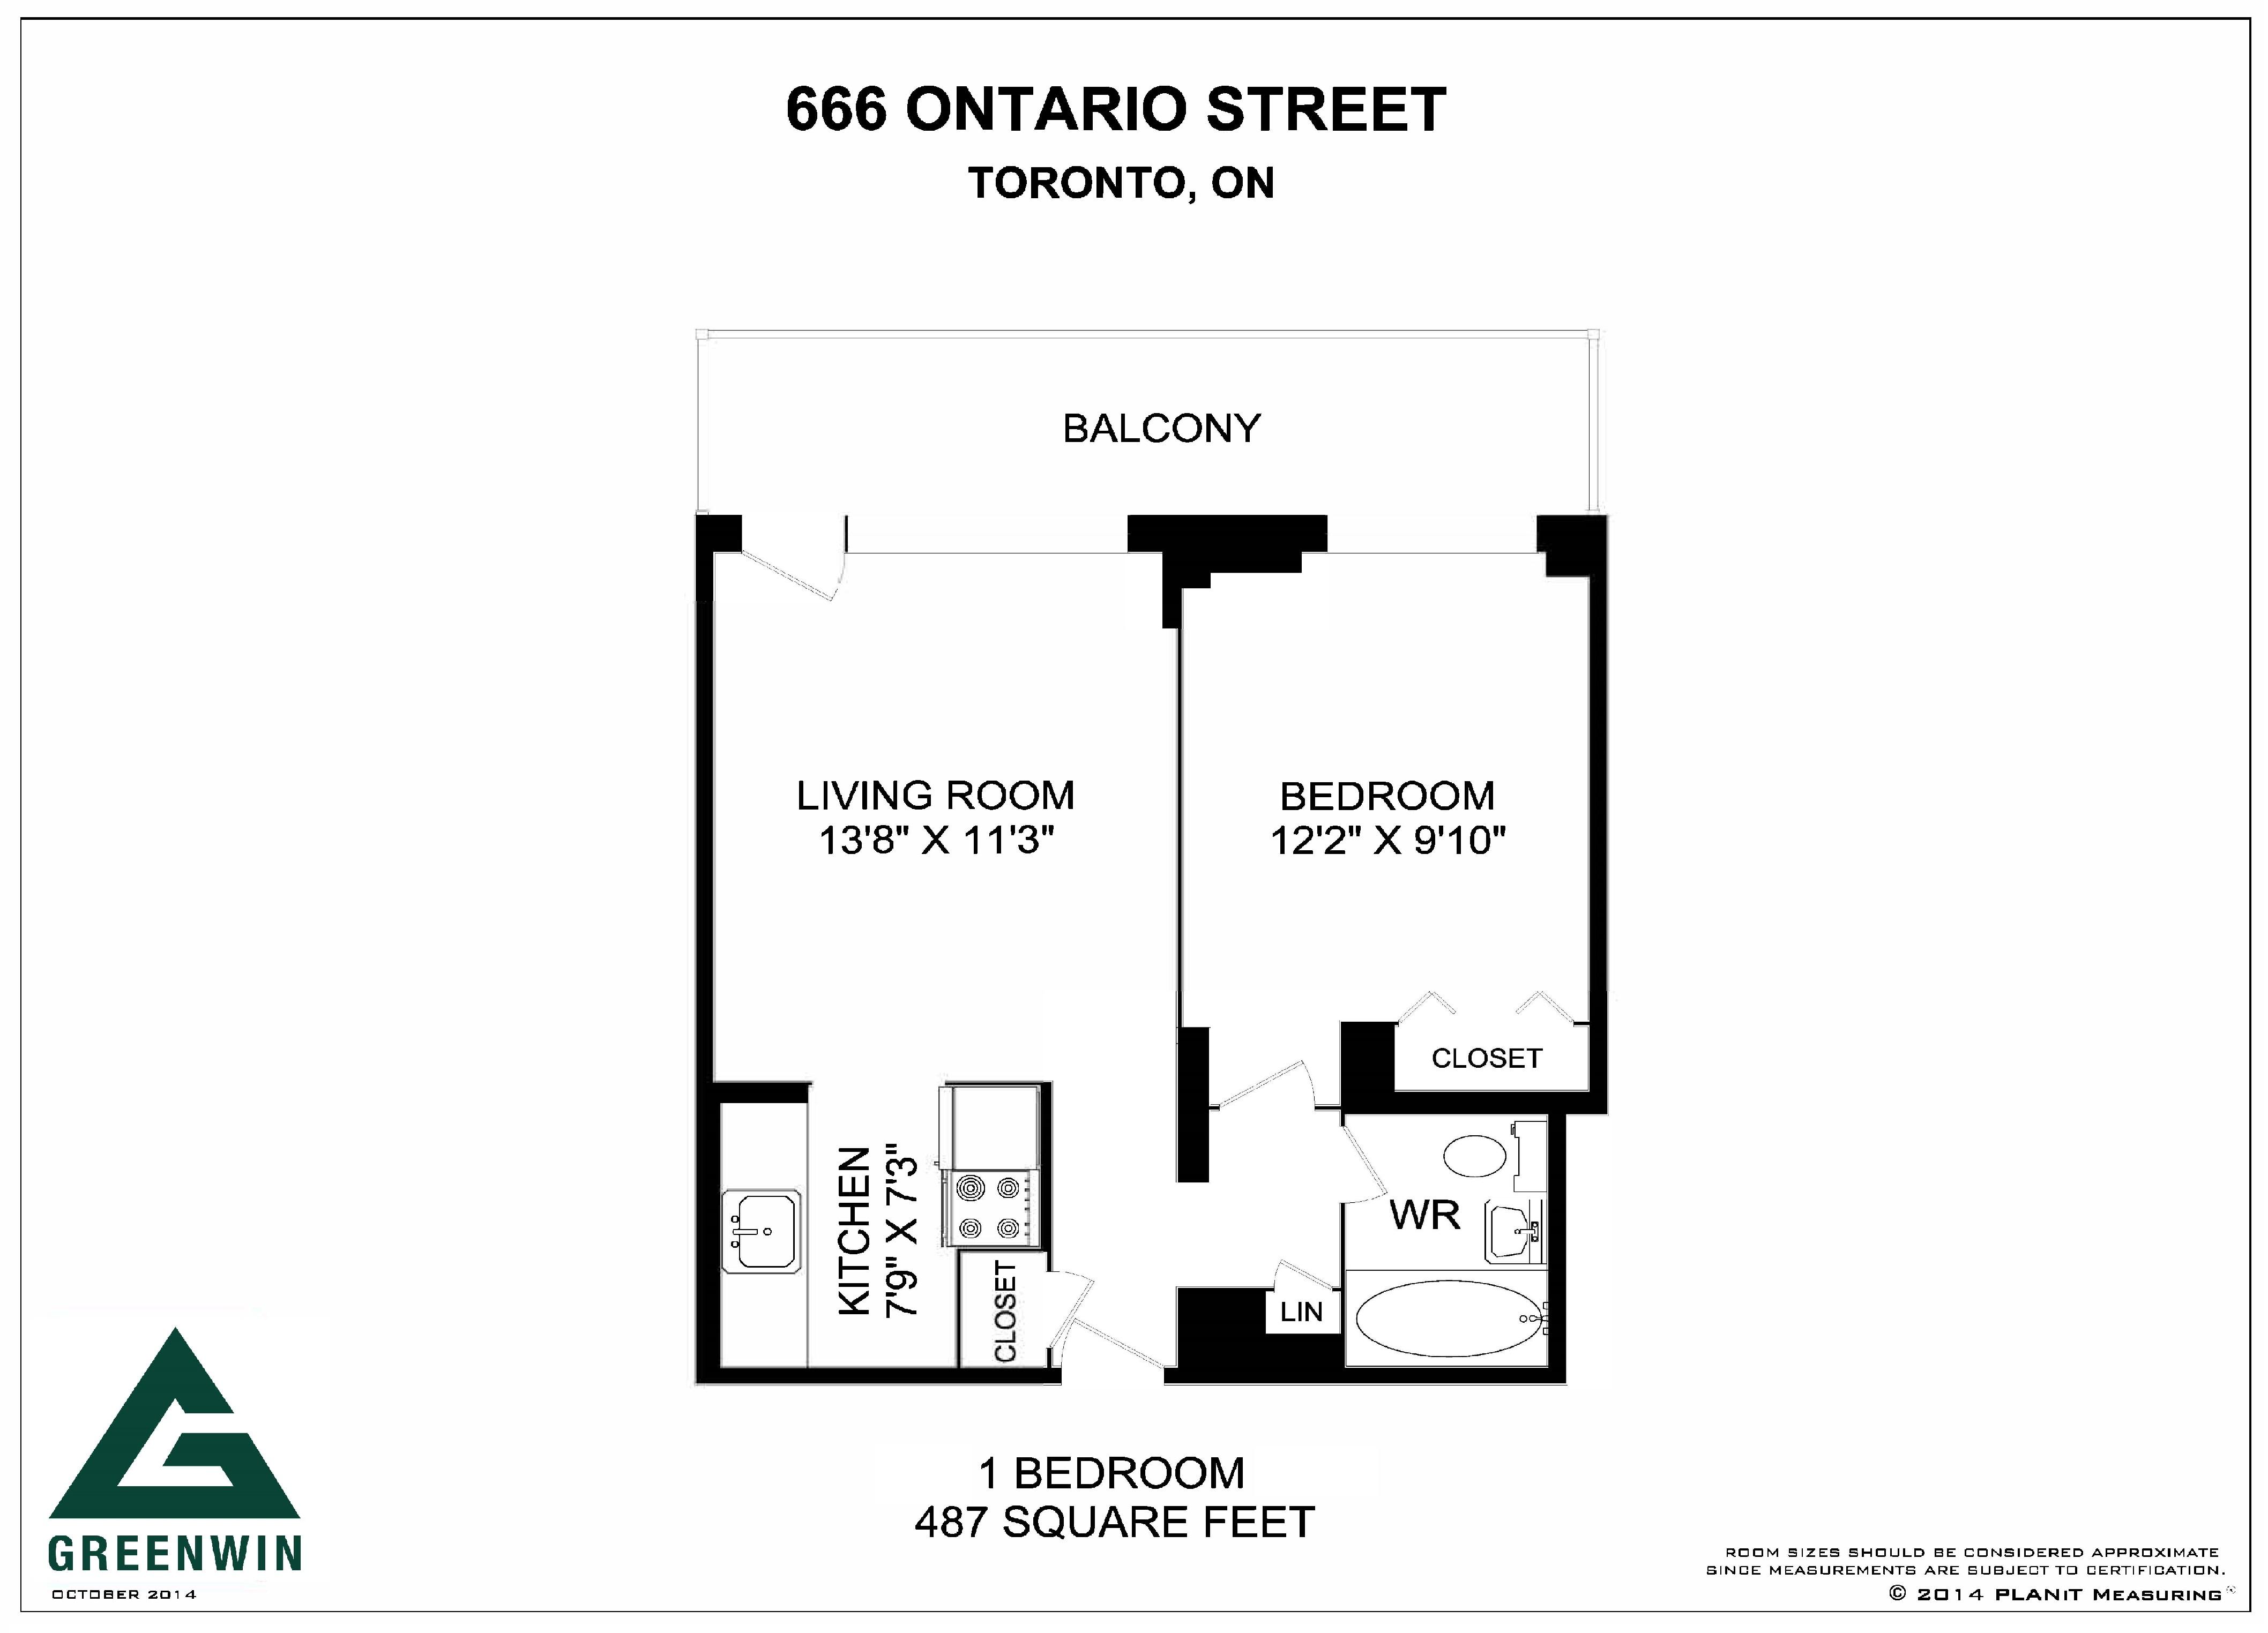 9 Ontario St.  Greenwin